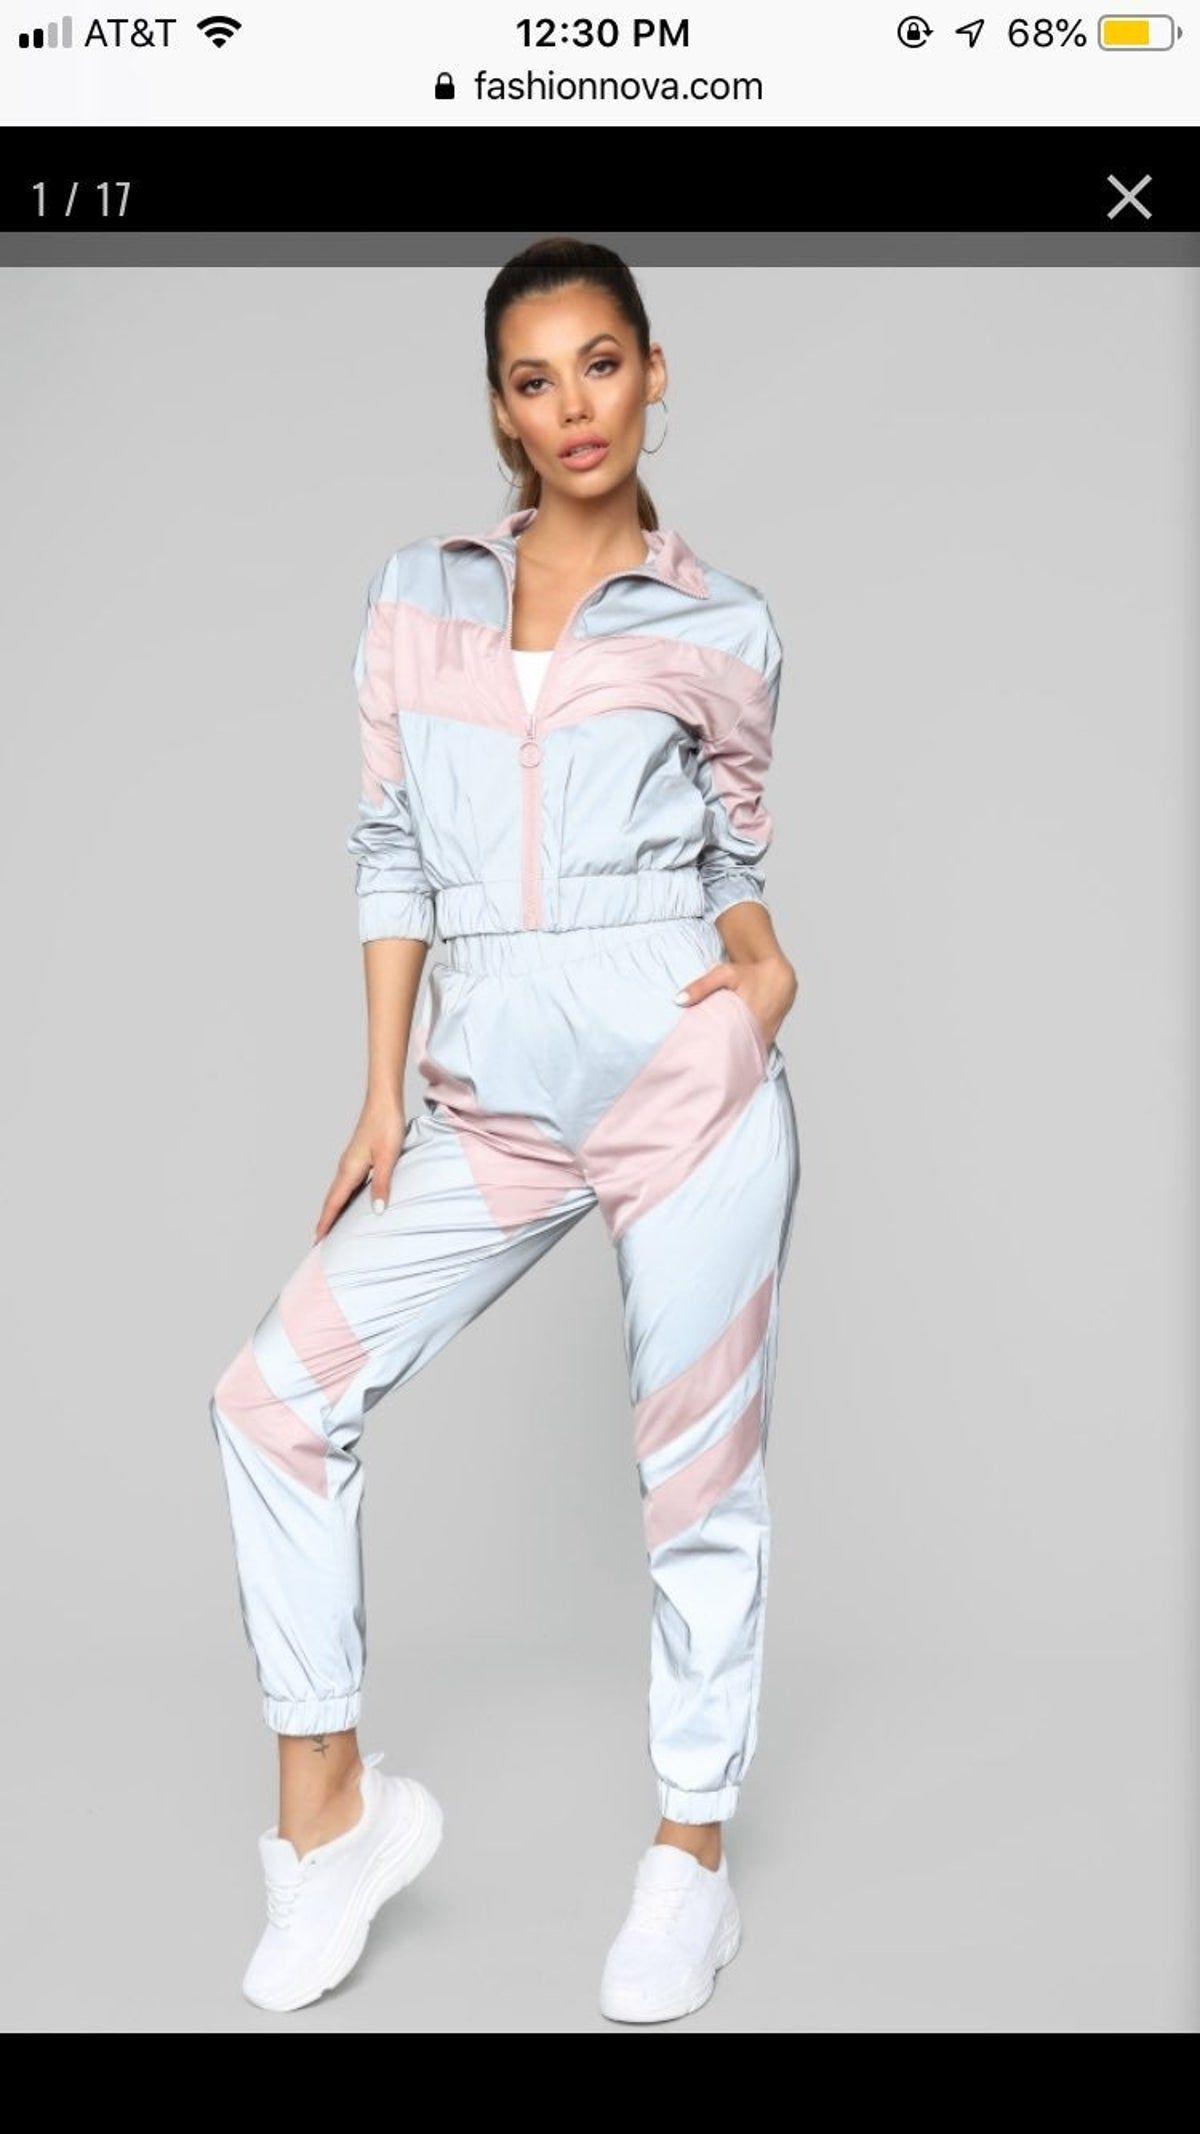 Fashion Nova Set In 2020 Girls Fashion Clothes Fashion Trendy Dress Outfits